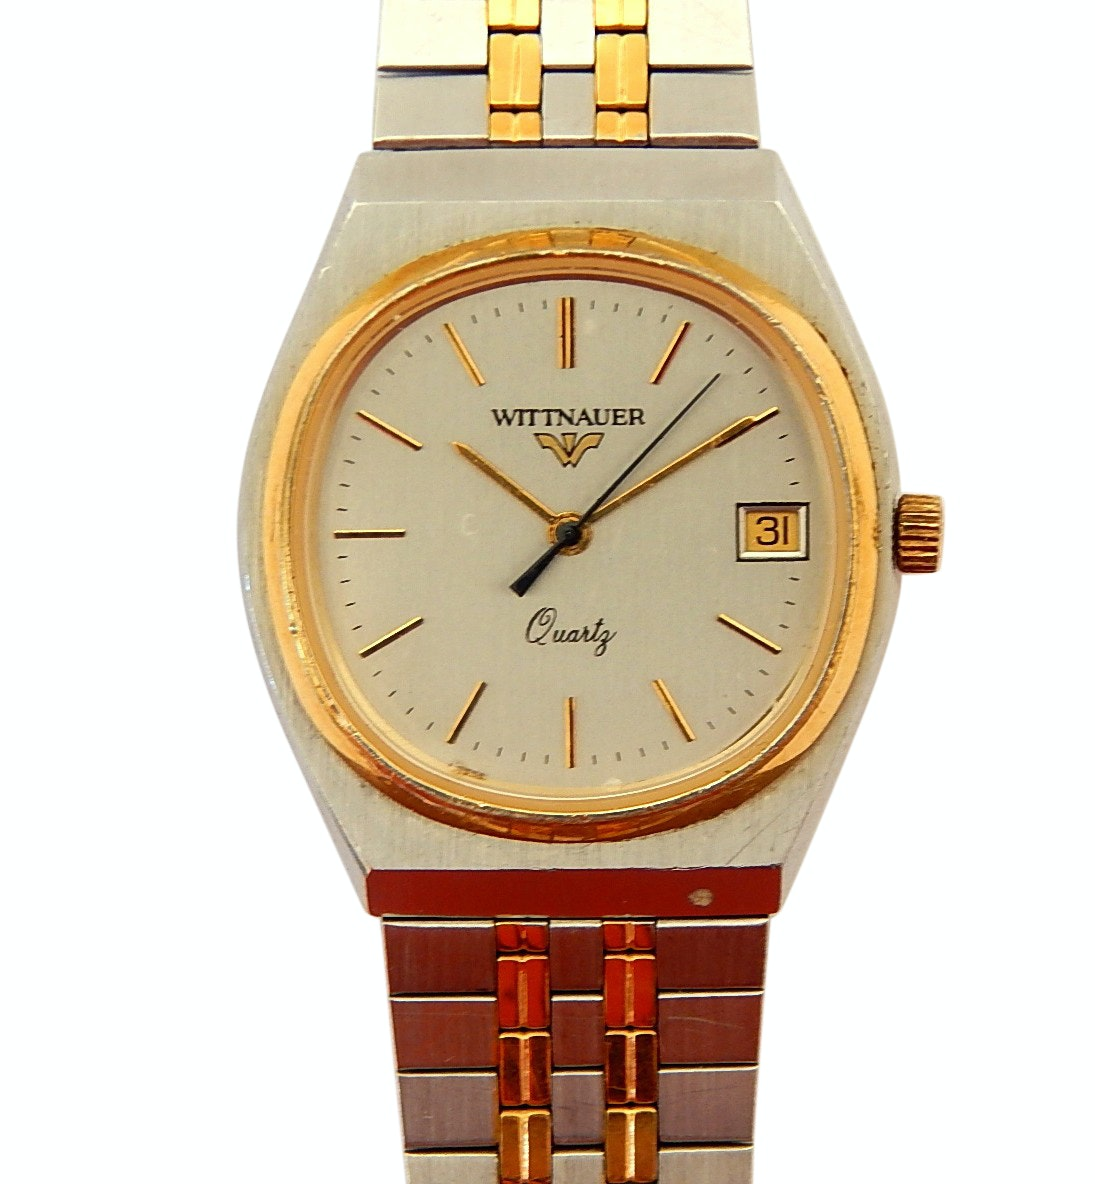 Two Tone Wittnauer Quartz Wristwatch - Repair